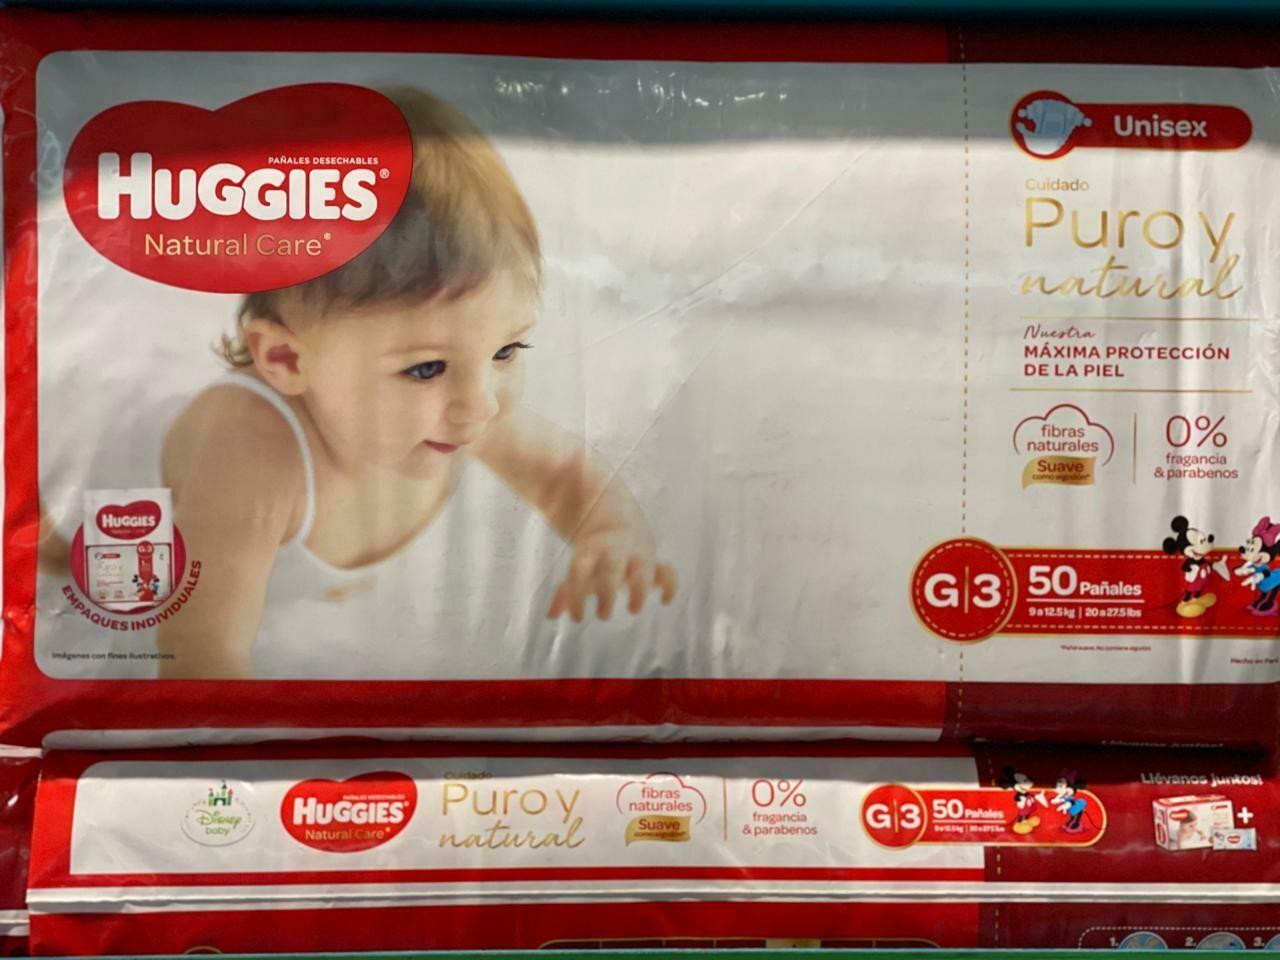 PAÑALES HUGGIES G3 X 50